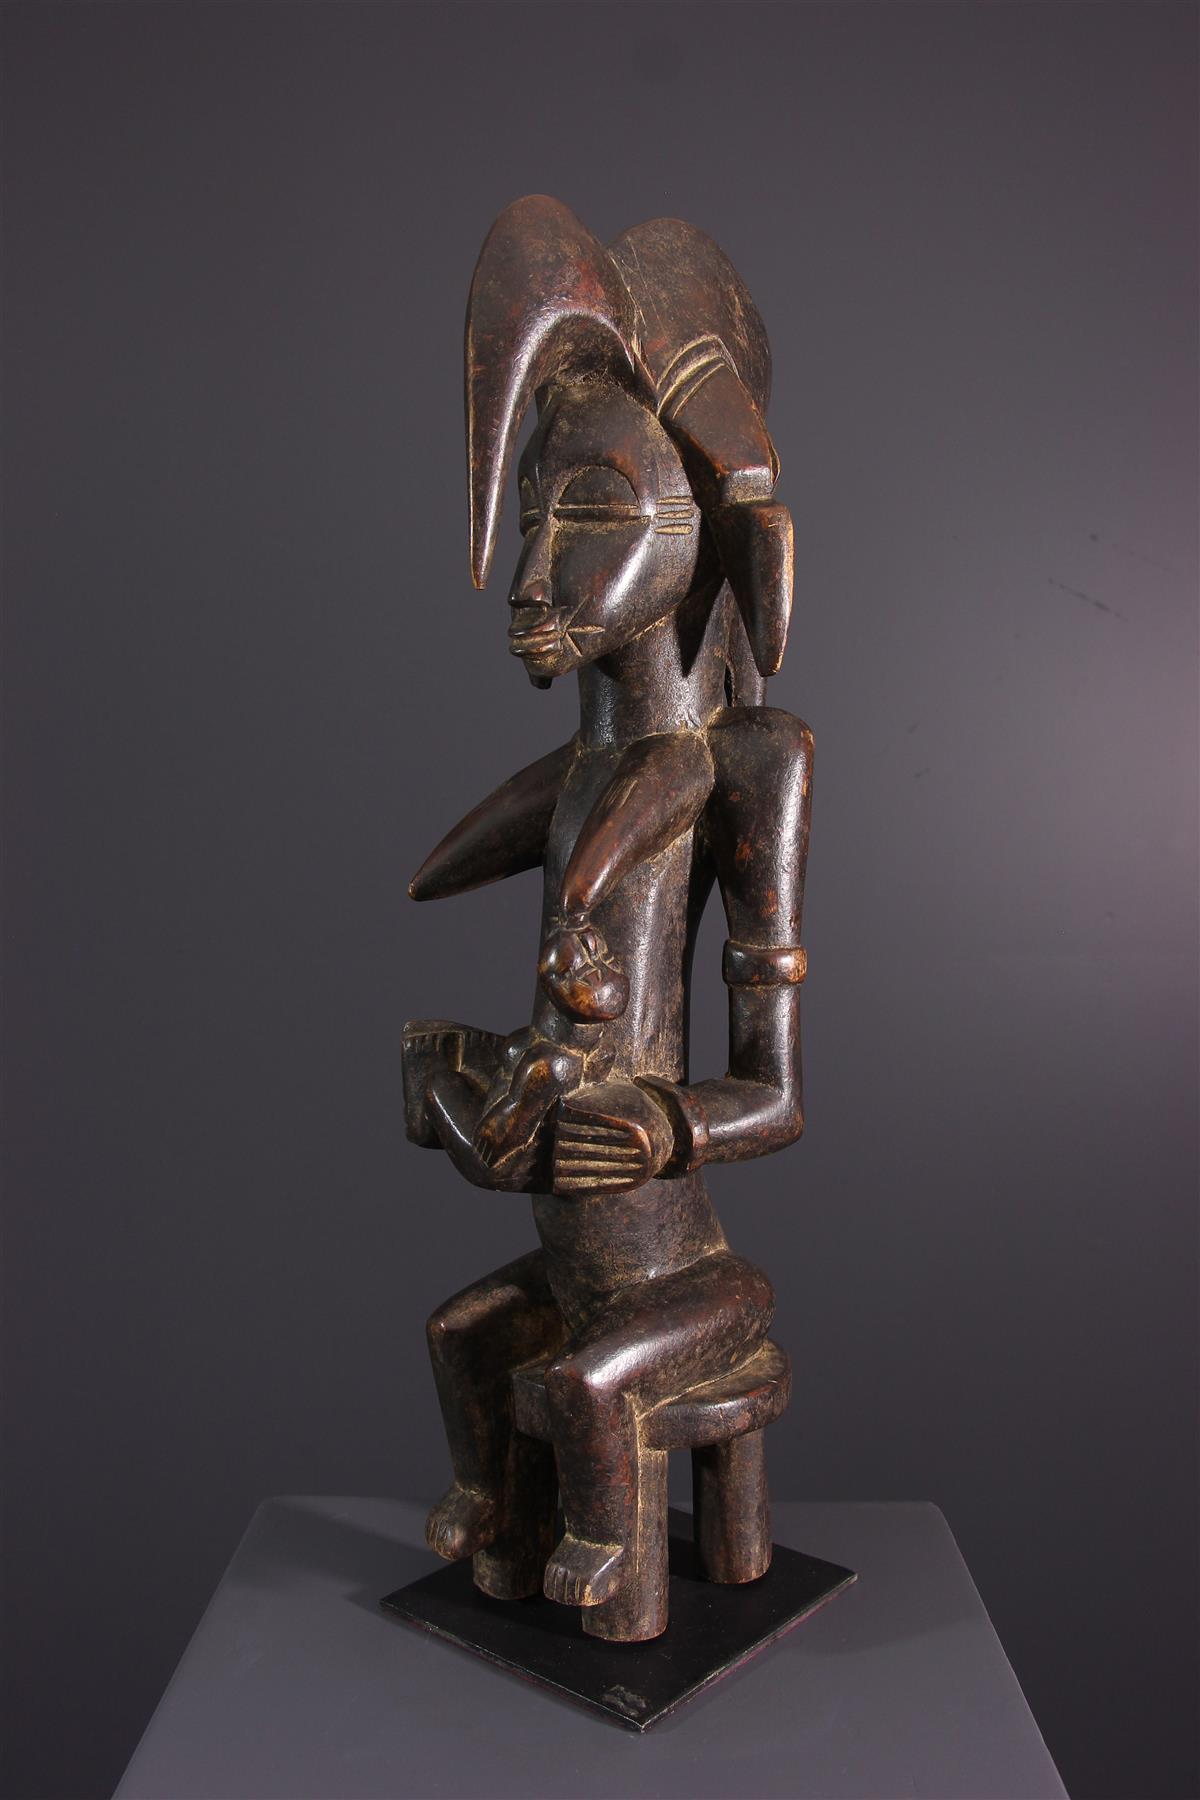 Tugubele Maternity - Tribal art